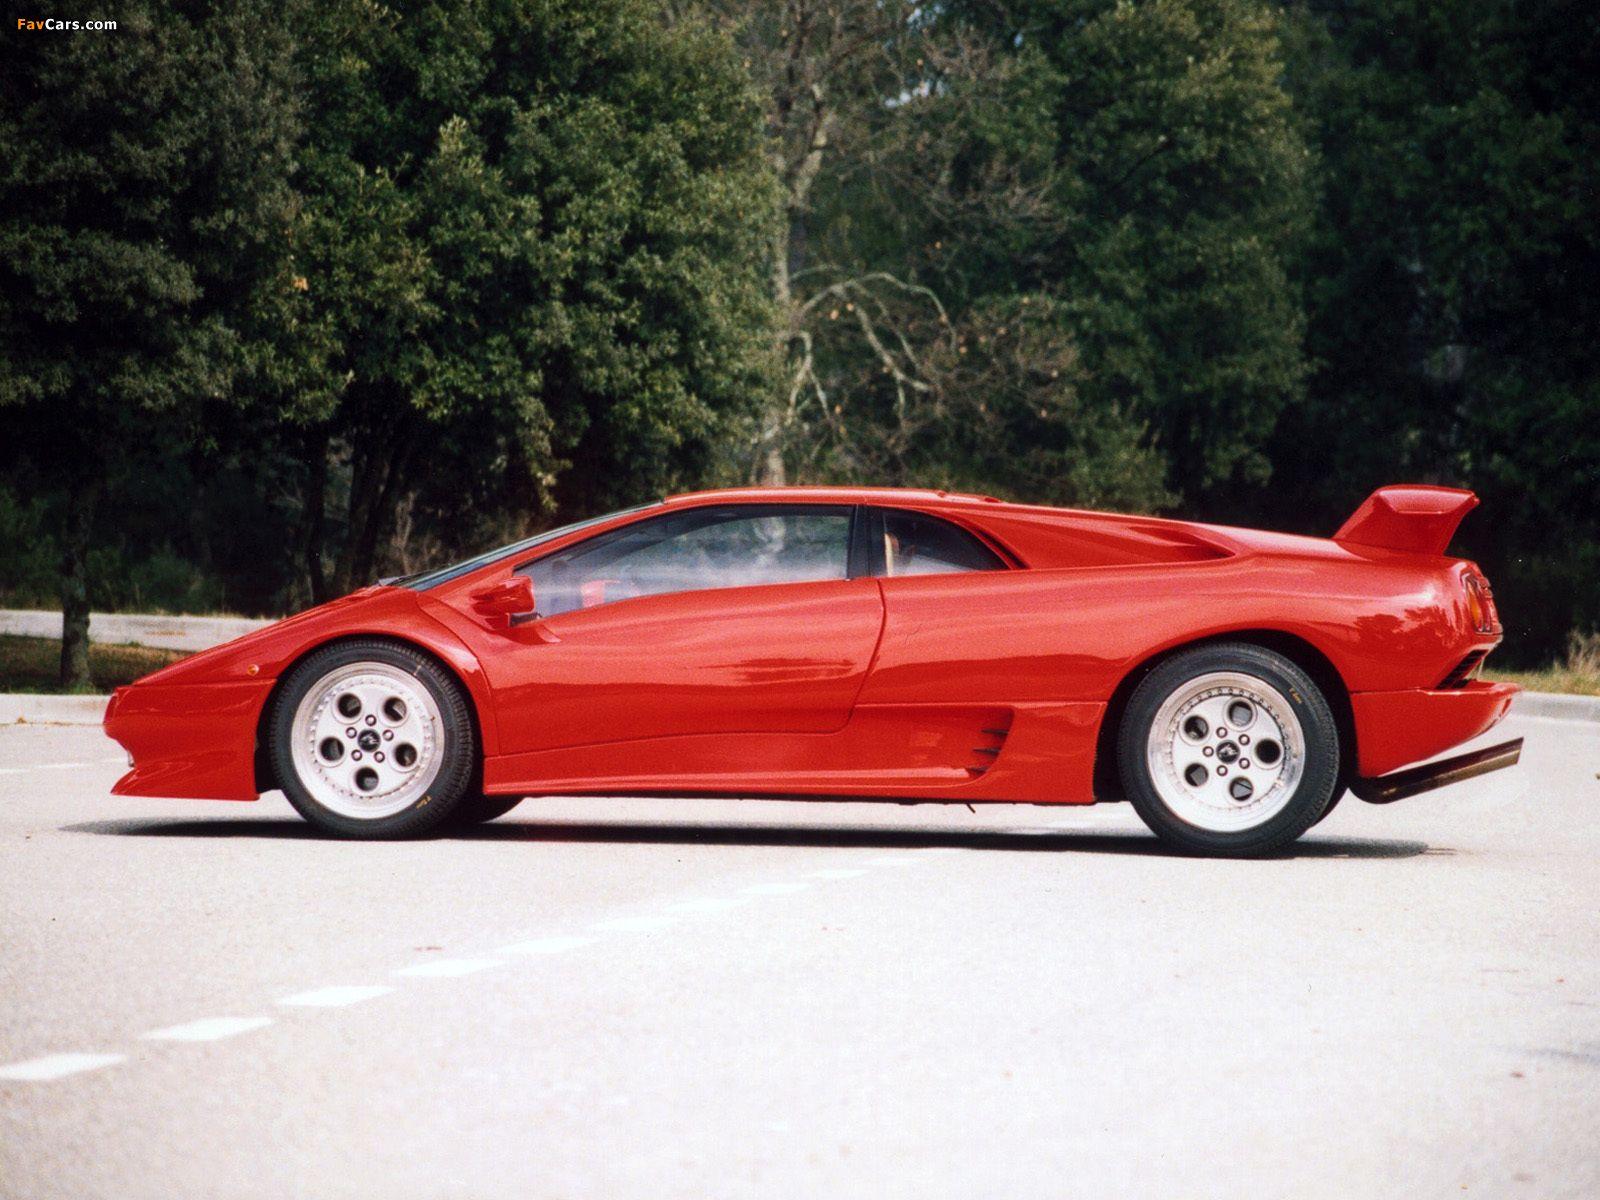 1990 Lamborghini Diablo Lamborghini Diablo Laptimes Specs